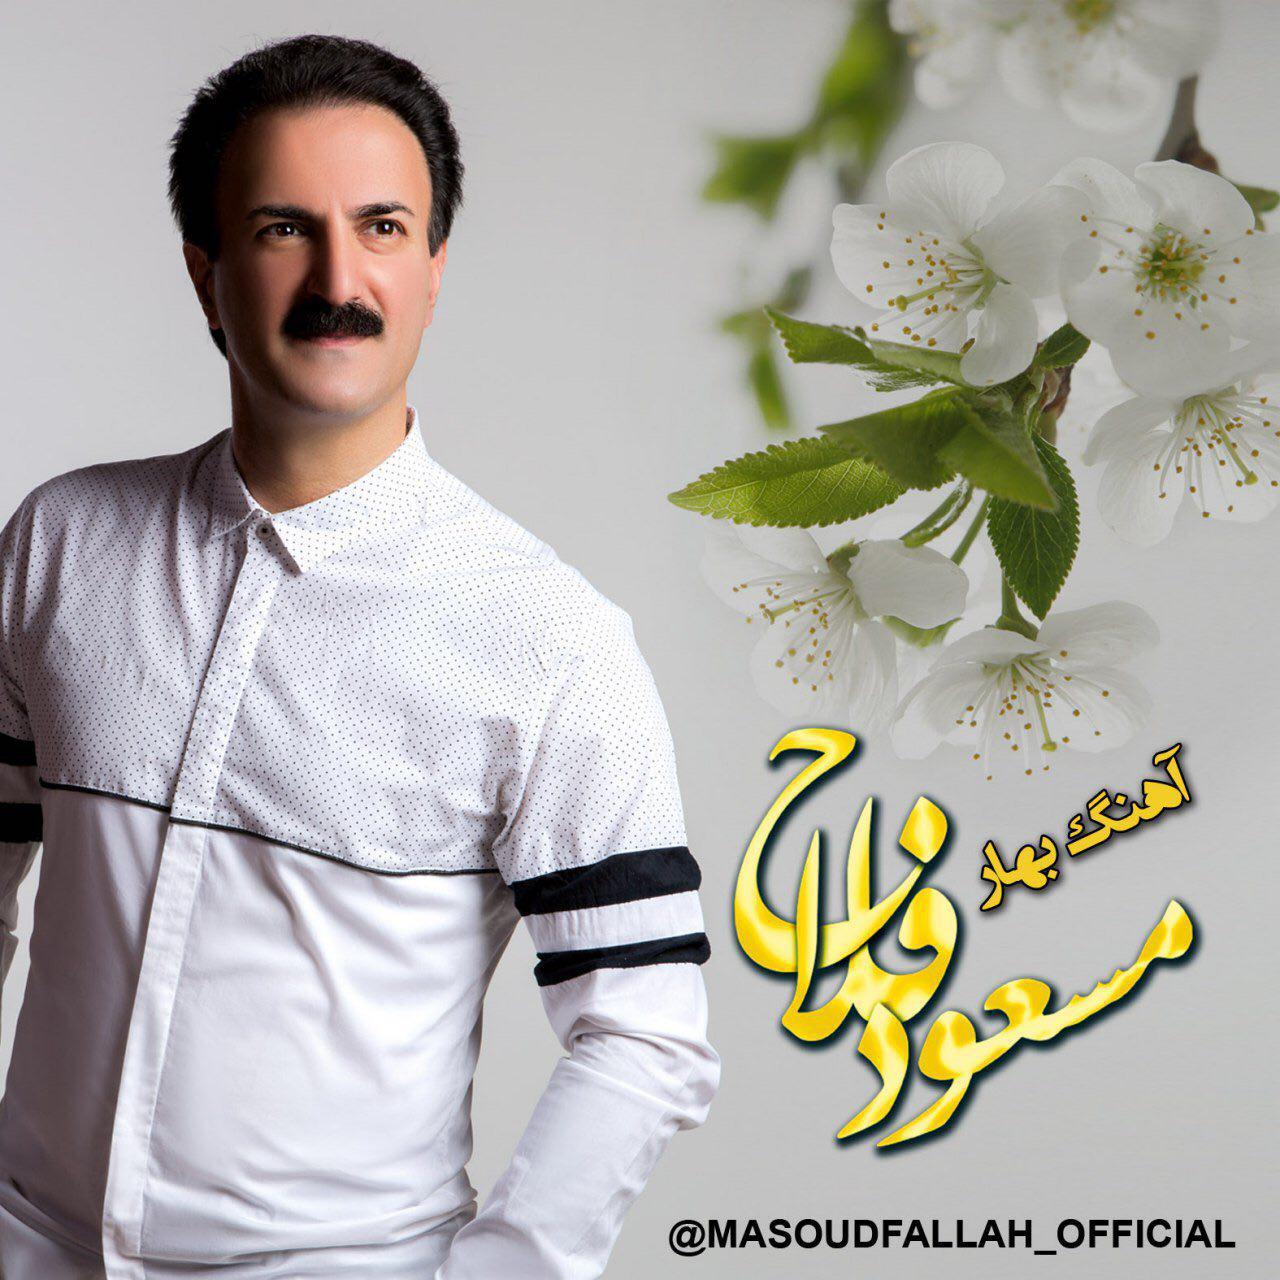 http://s8.picofile.com/file/8356109868/08Masoud_Fallah_Bahar.jpg